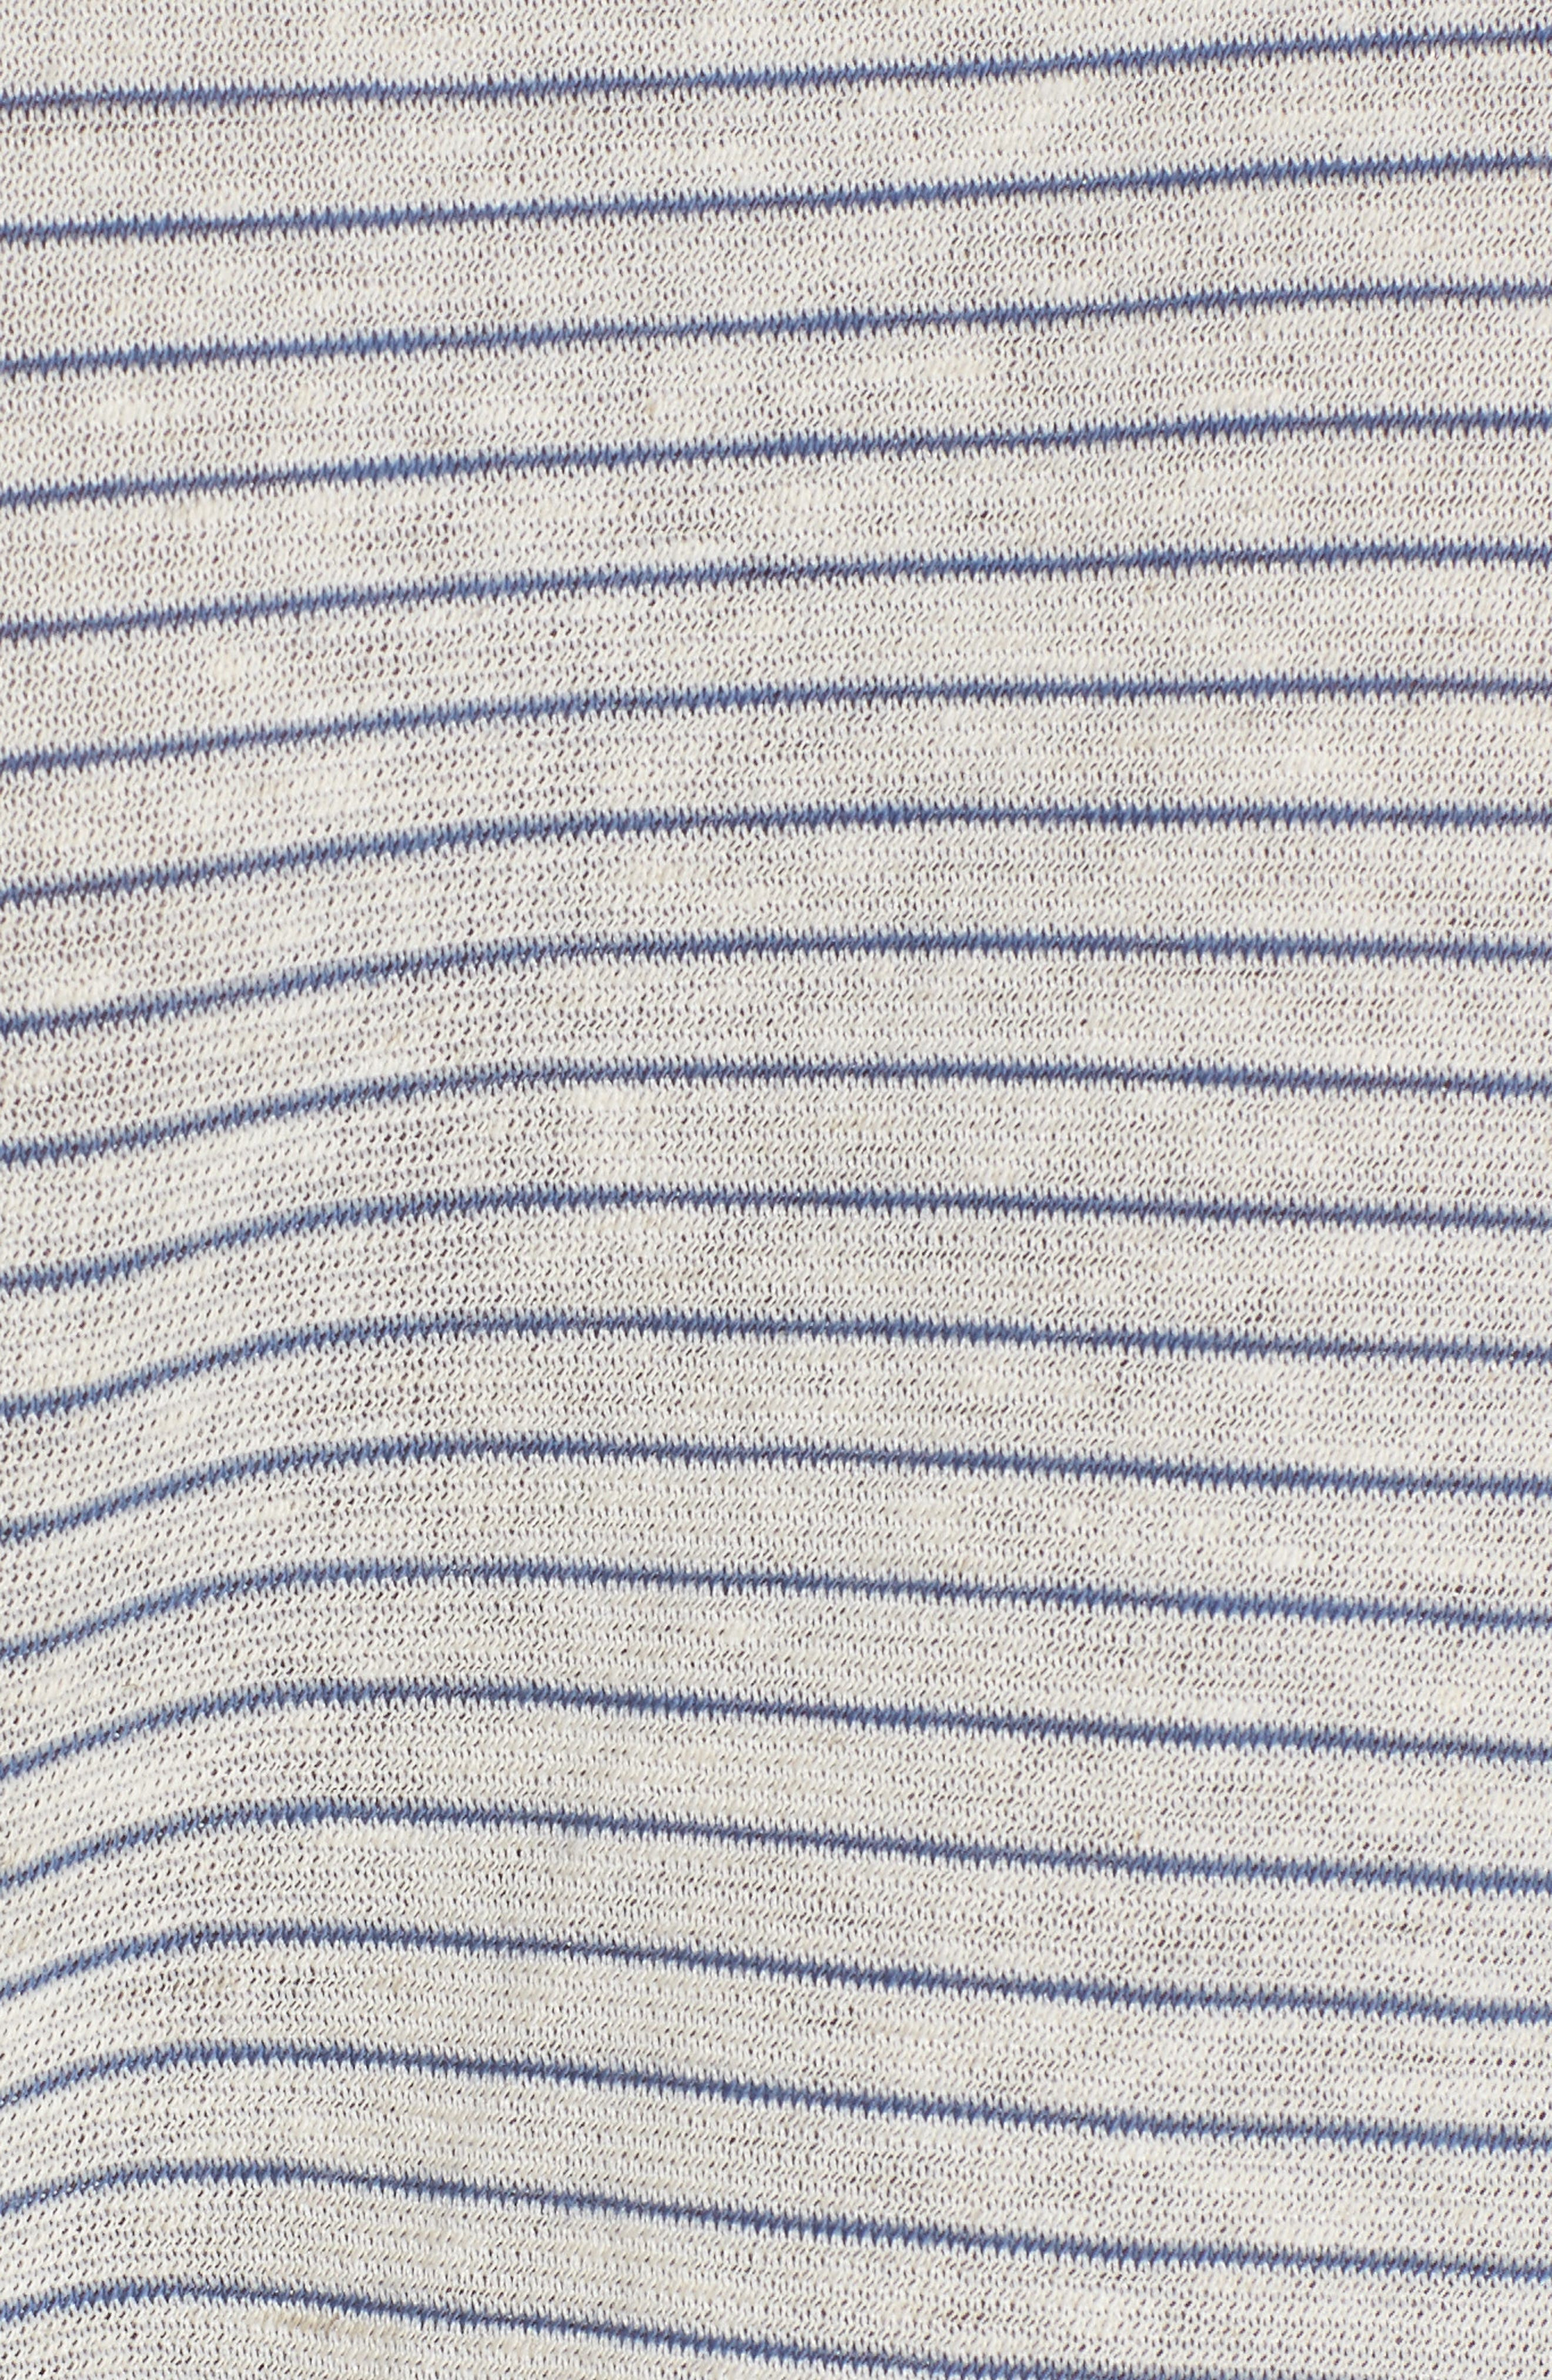 Side Tie Tee,                             Alternate thumbnail 5, color,                             Ivory Egret Chelsea Stripe